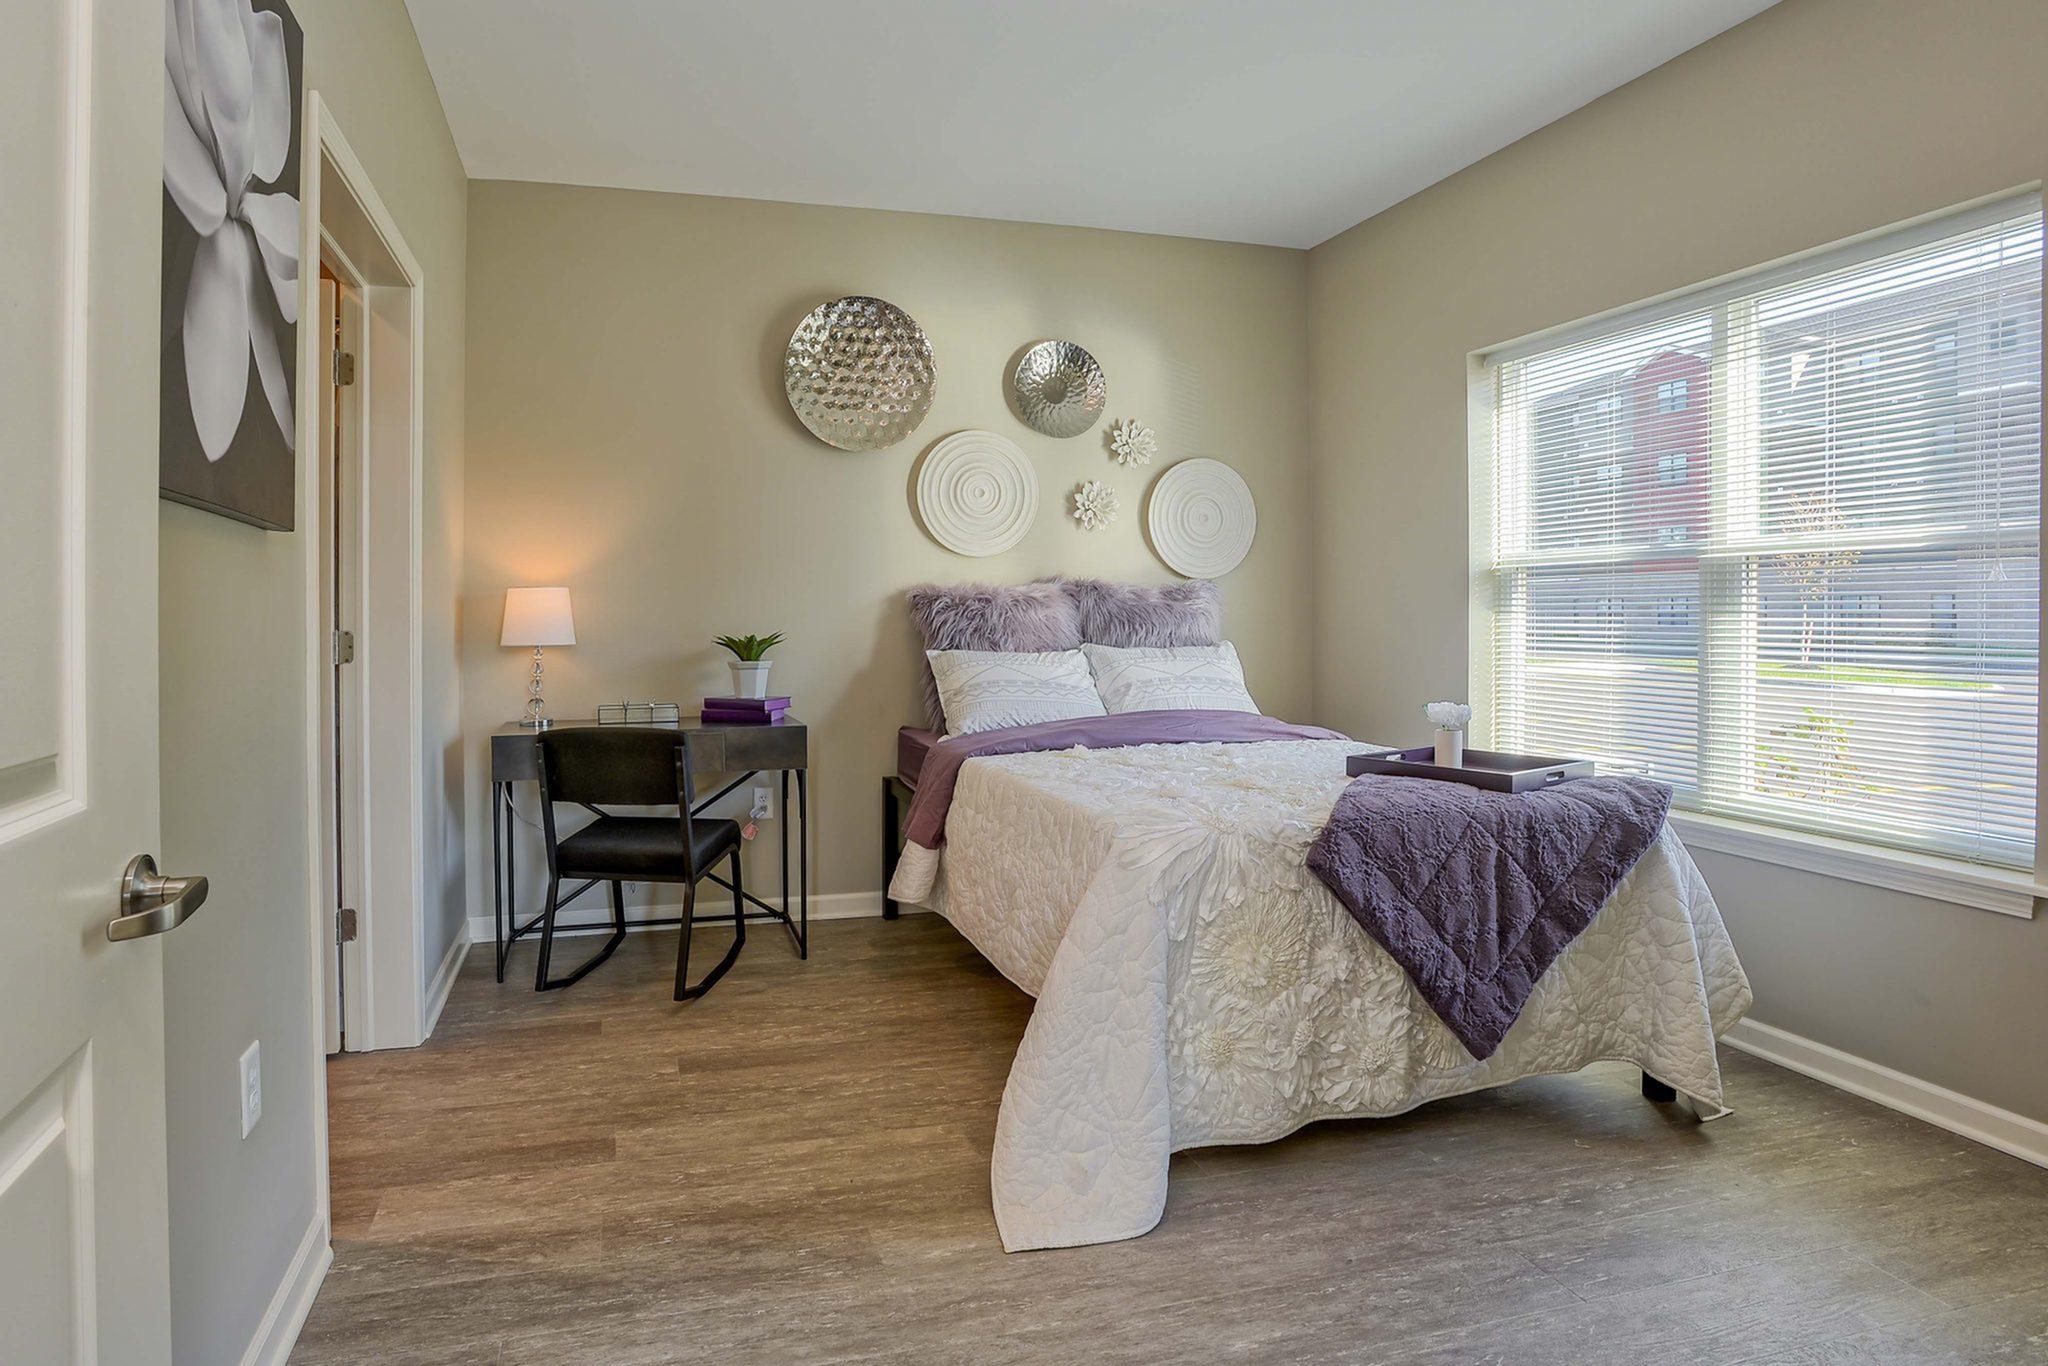 www.monarchstudentliving.com for rent